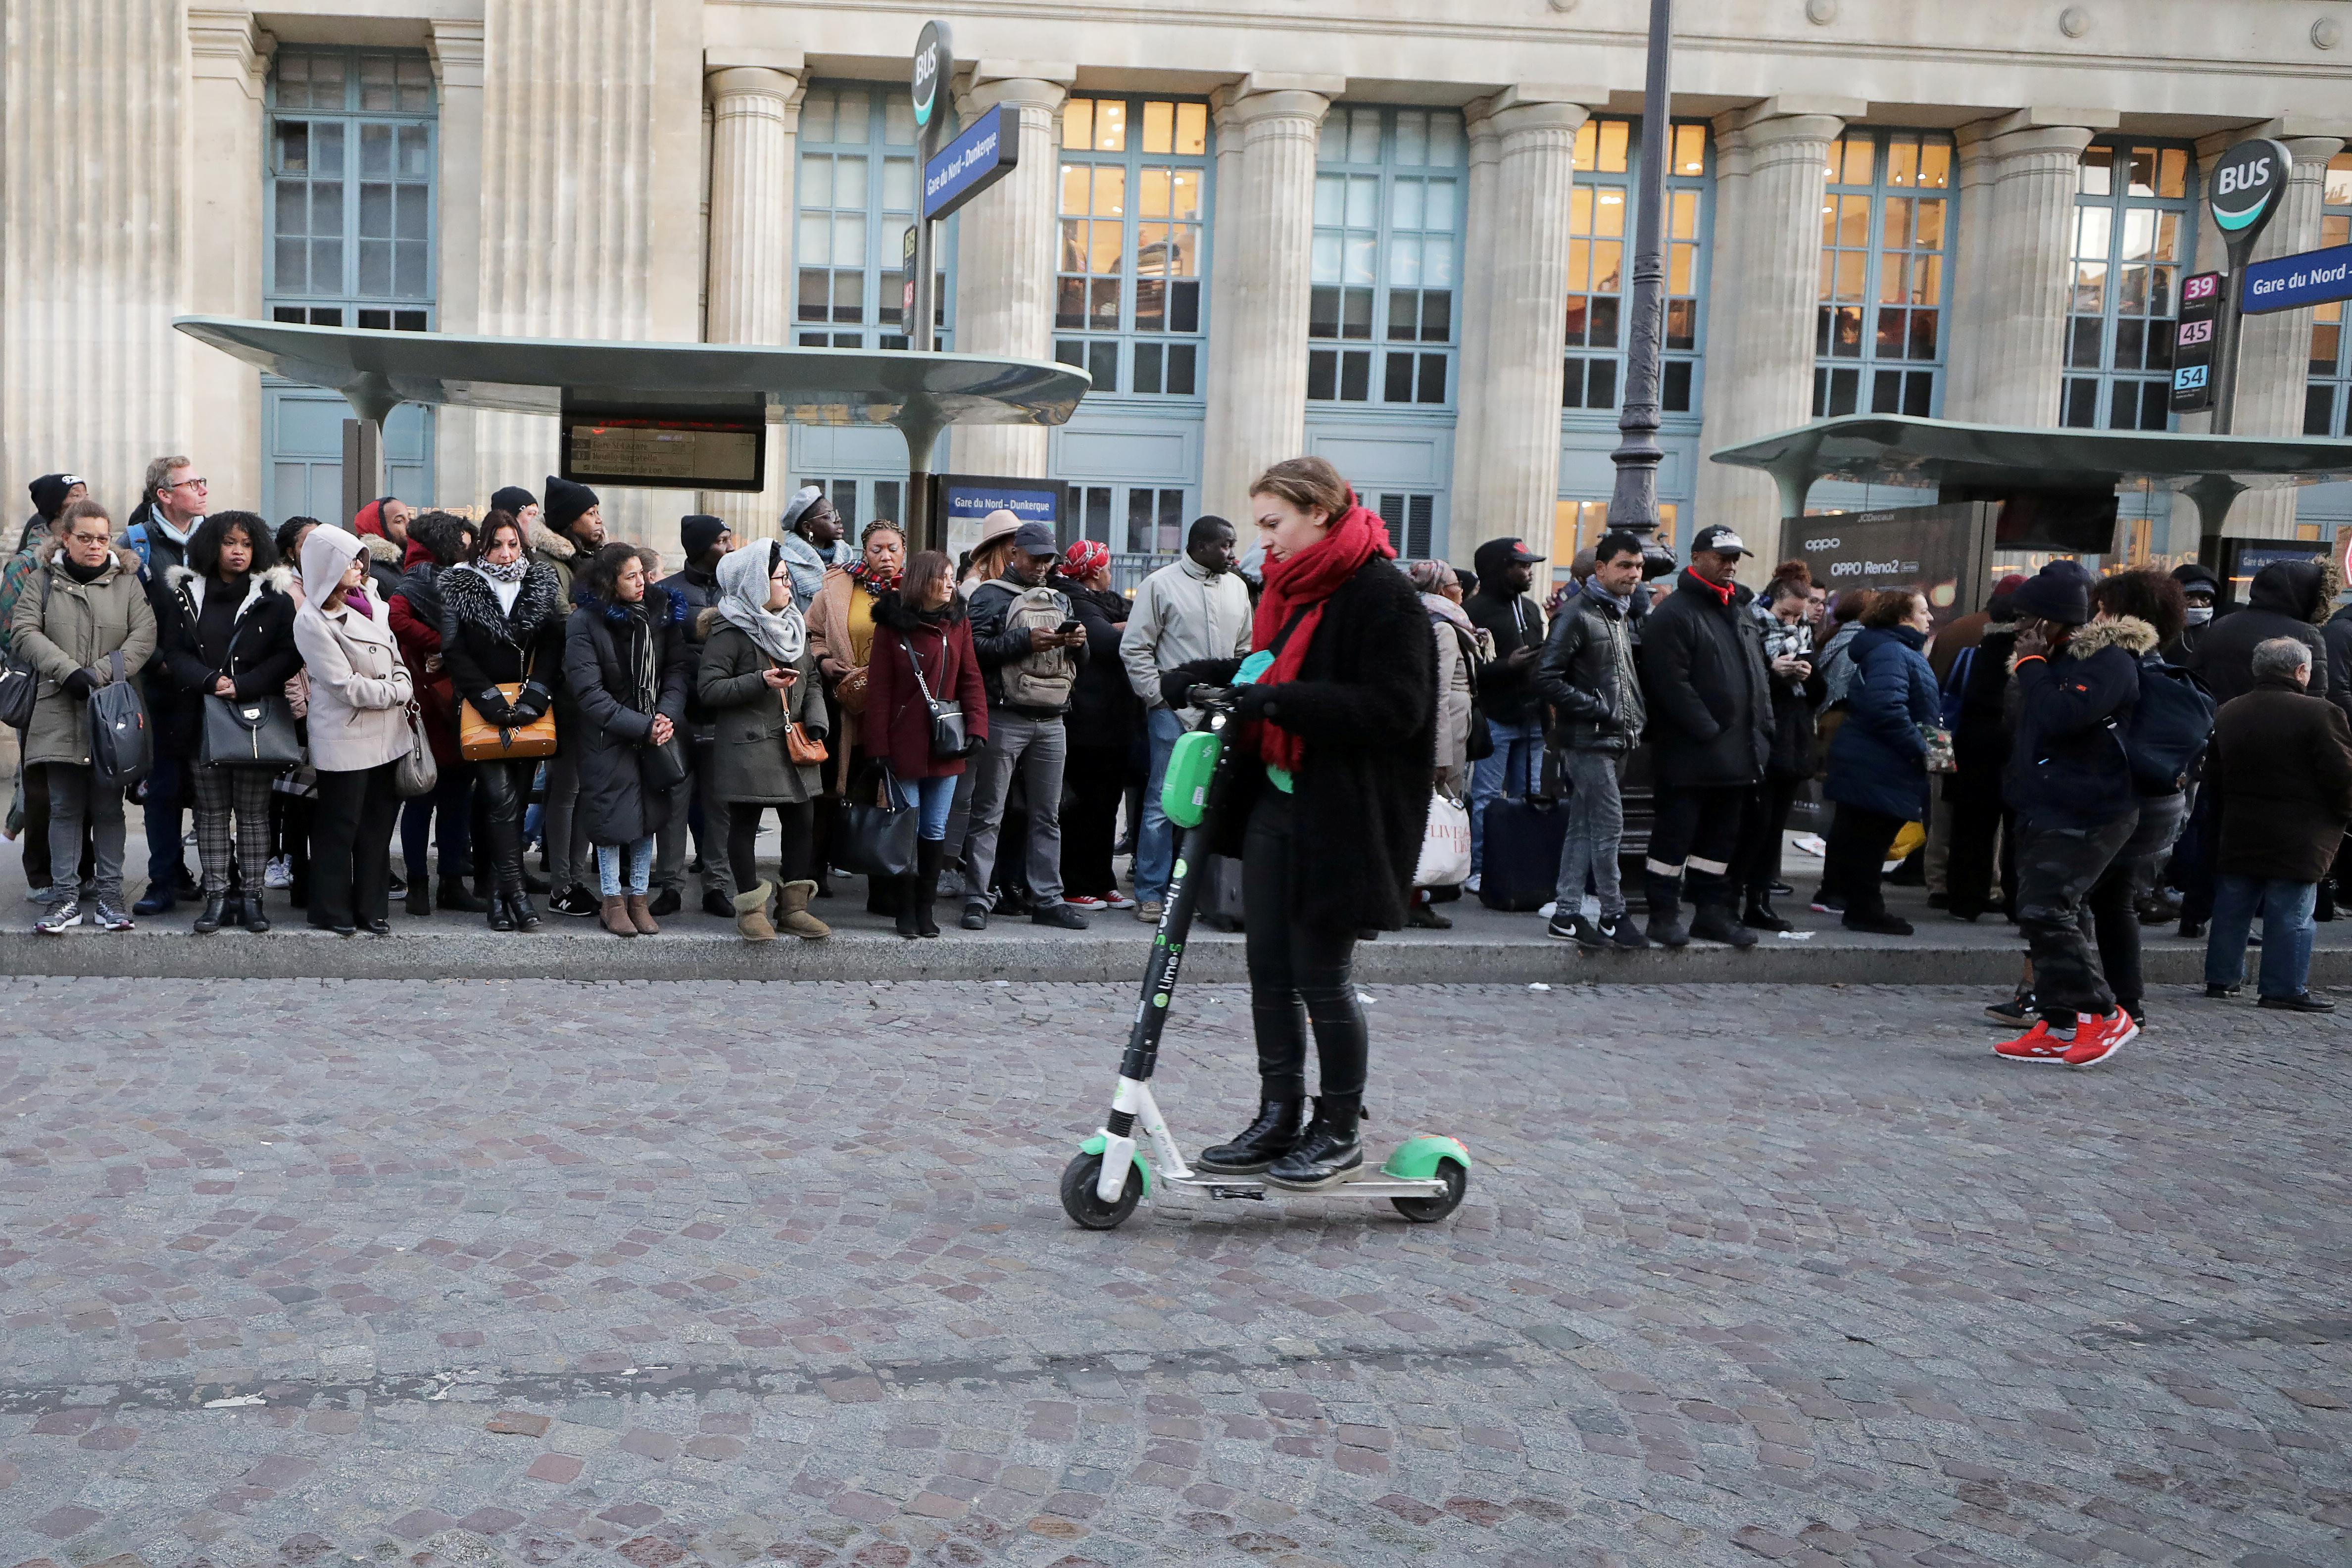 Paris commuters jump on scooters as transport strikes block metro